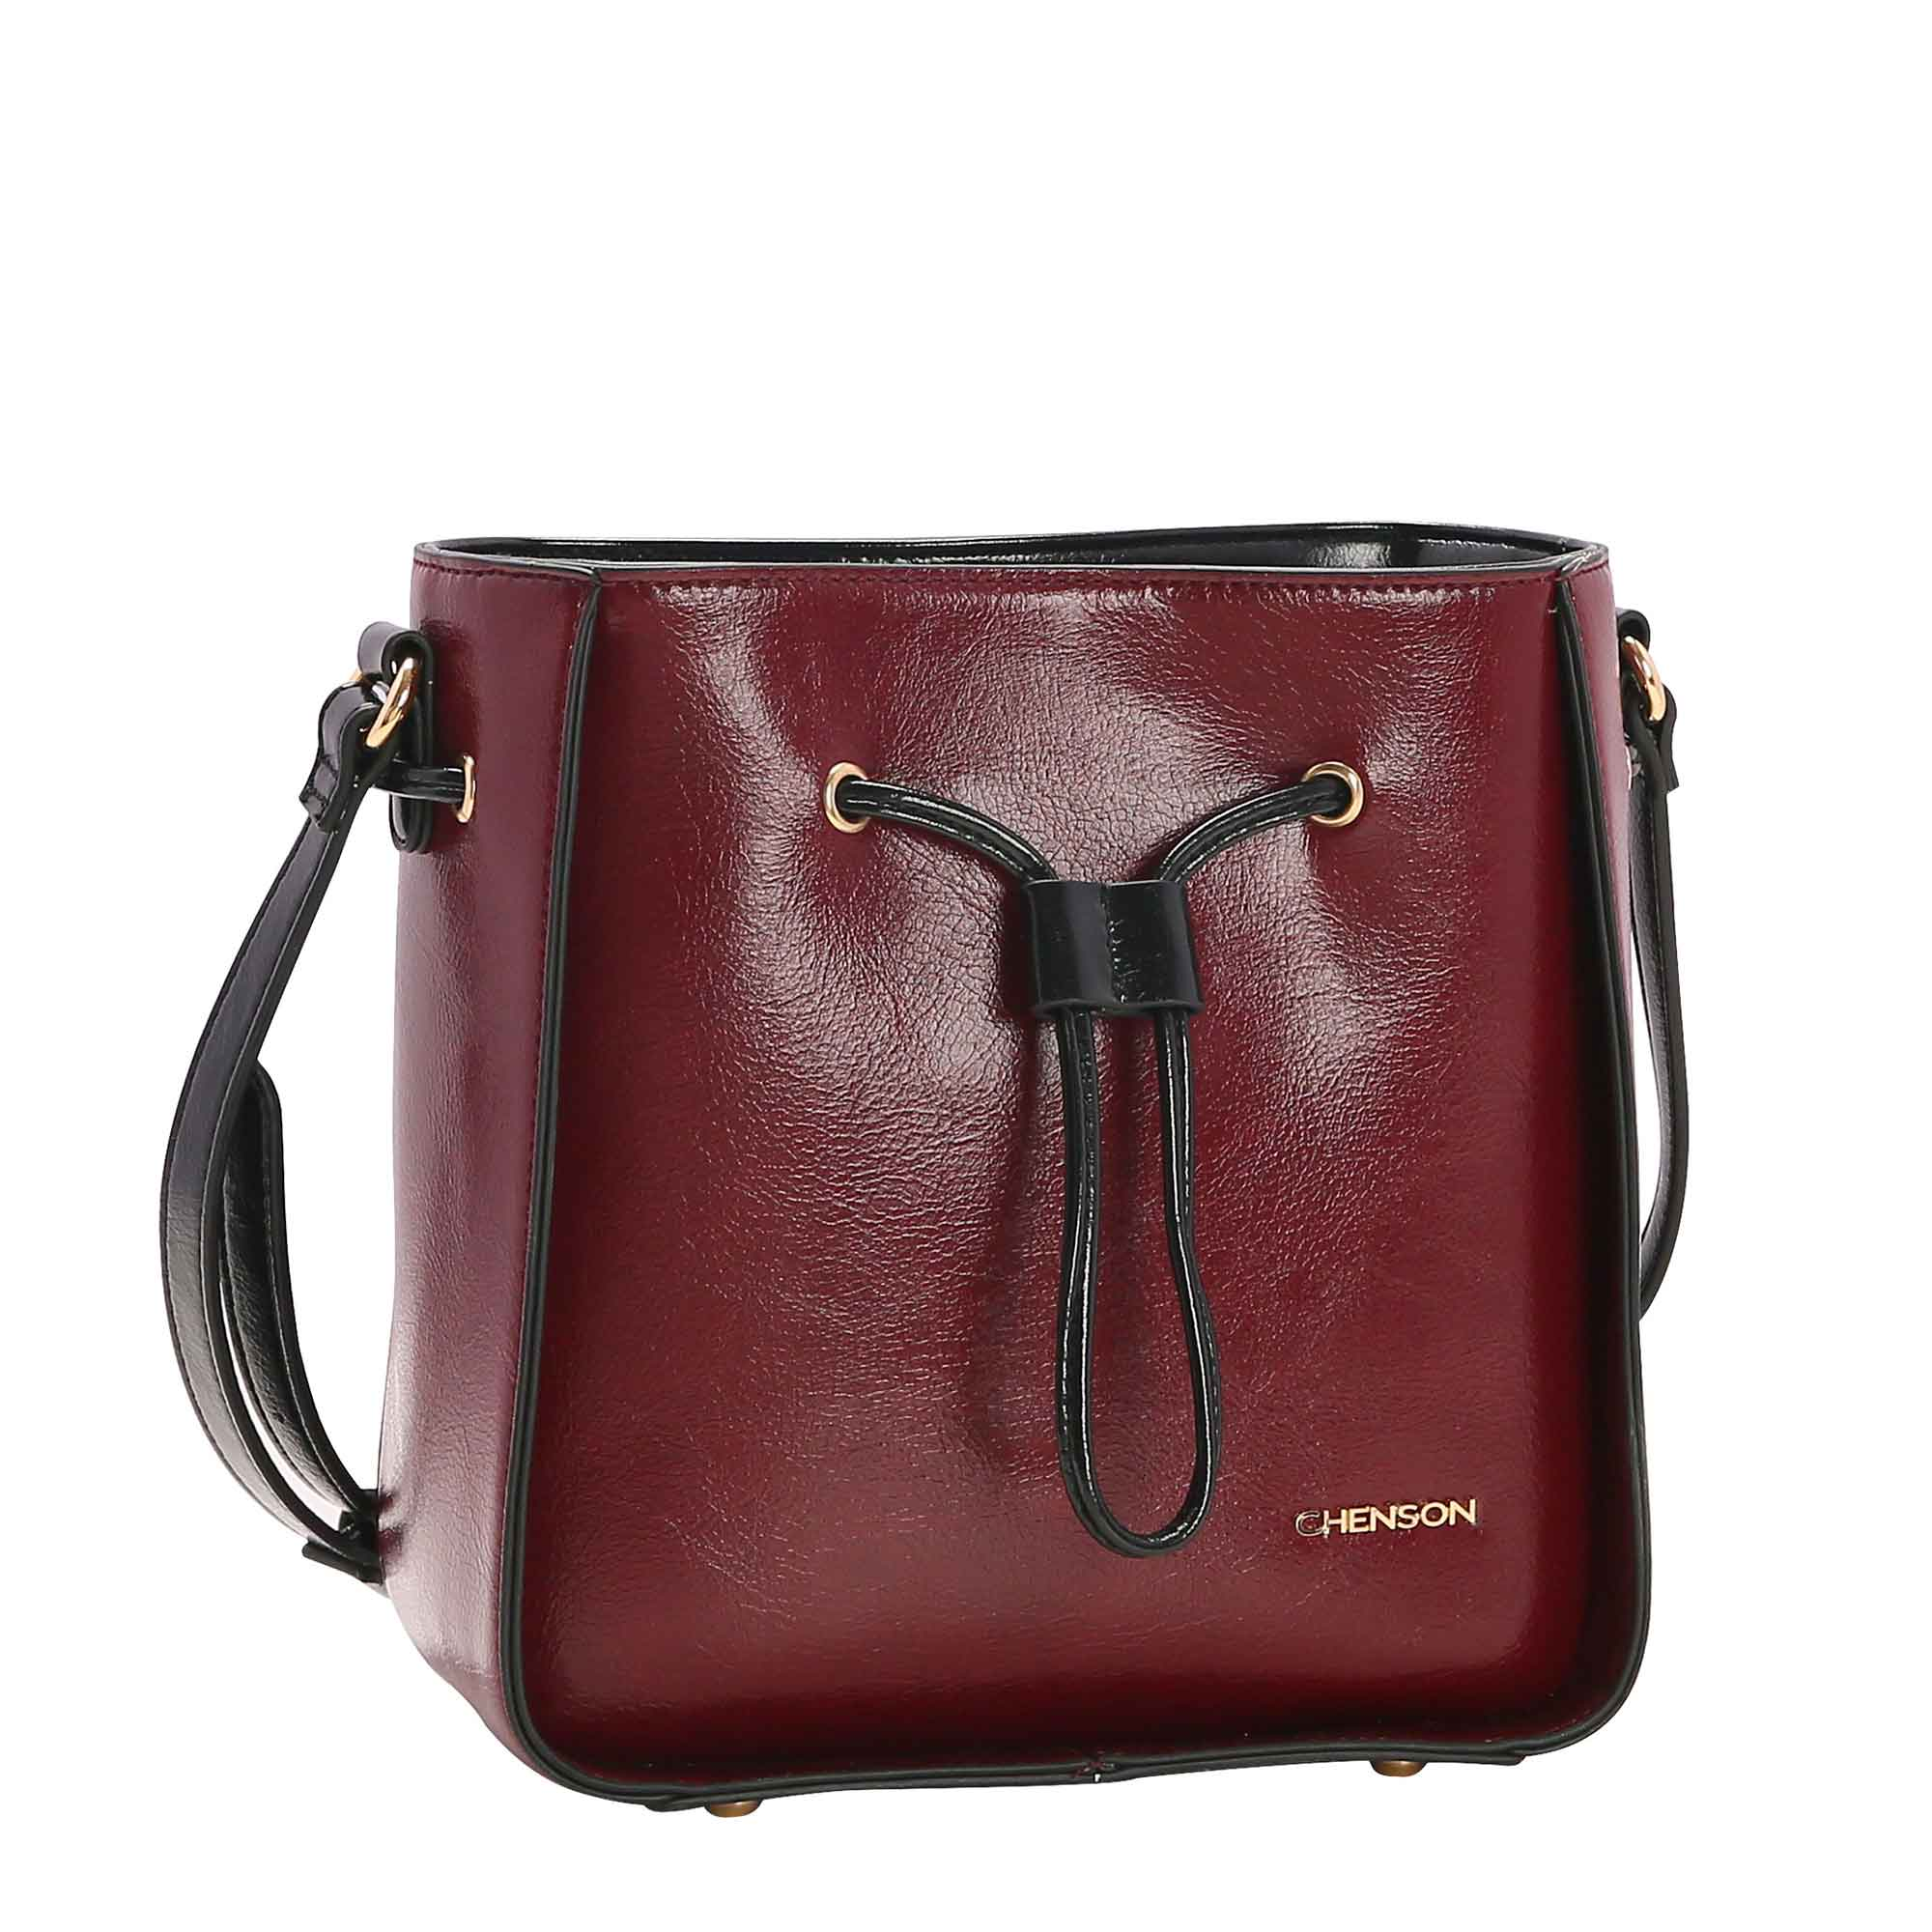 Bolsa Feminina Chenson Verniz Clássico Transversal 3482657